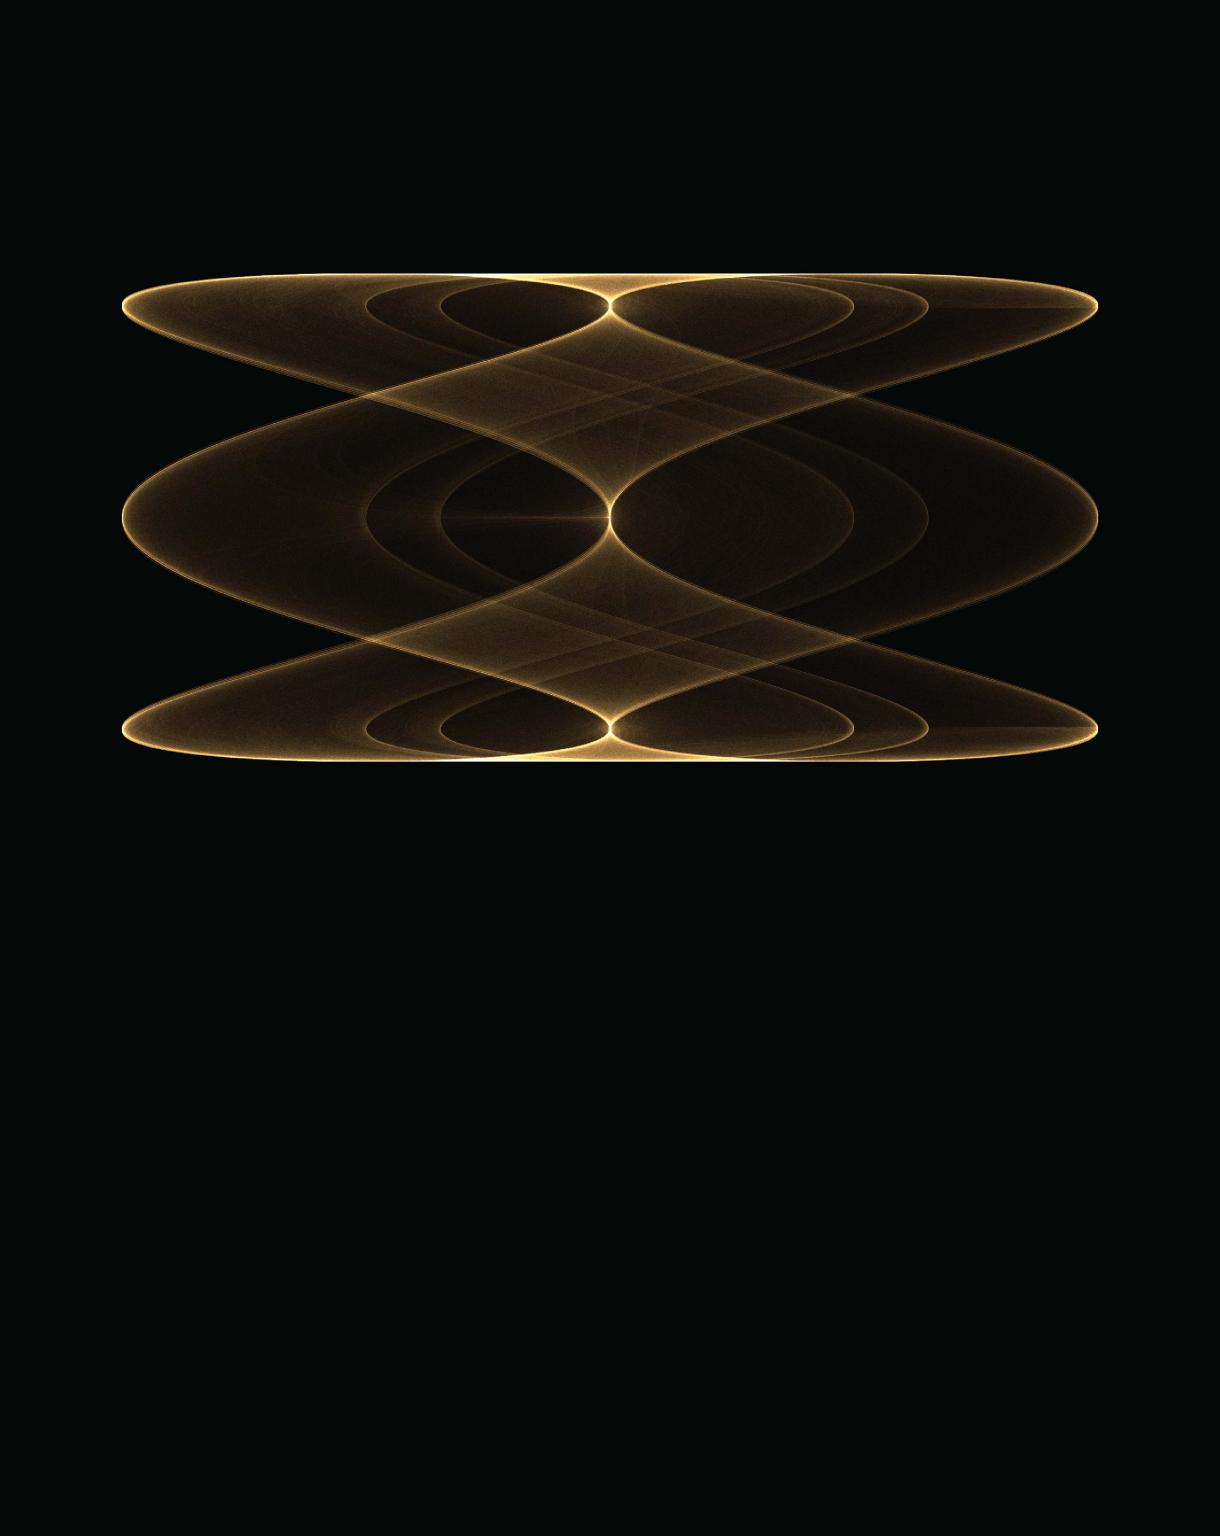 Gold helix against black background